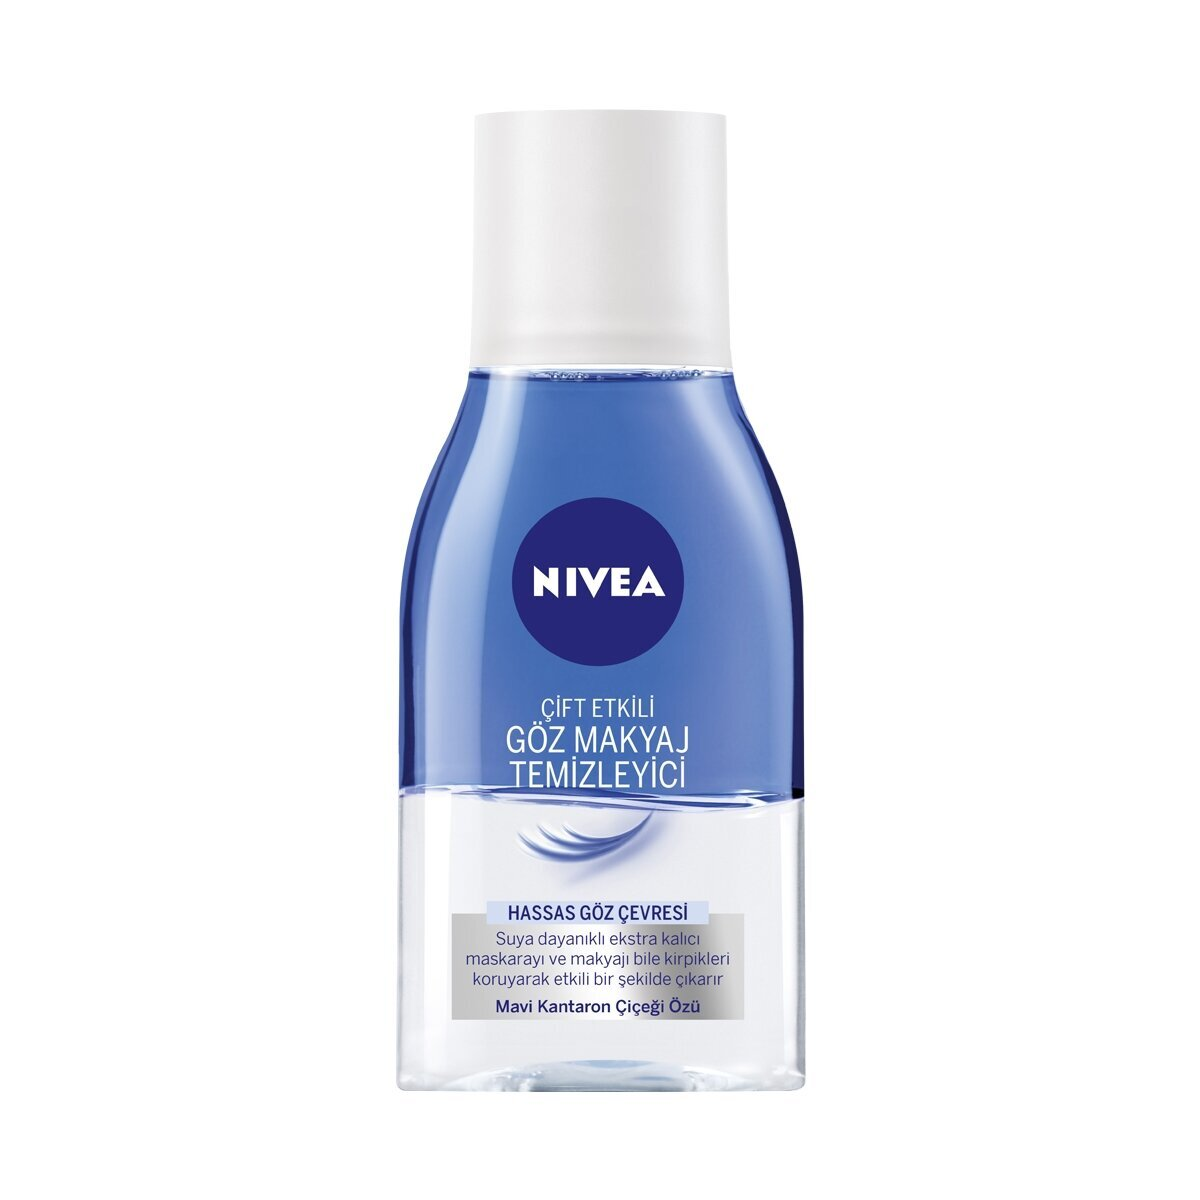 Çift Etkili Göz Makyaj Temizleme Losyonu 125 ml